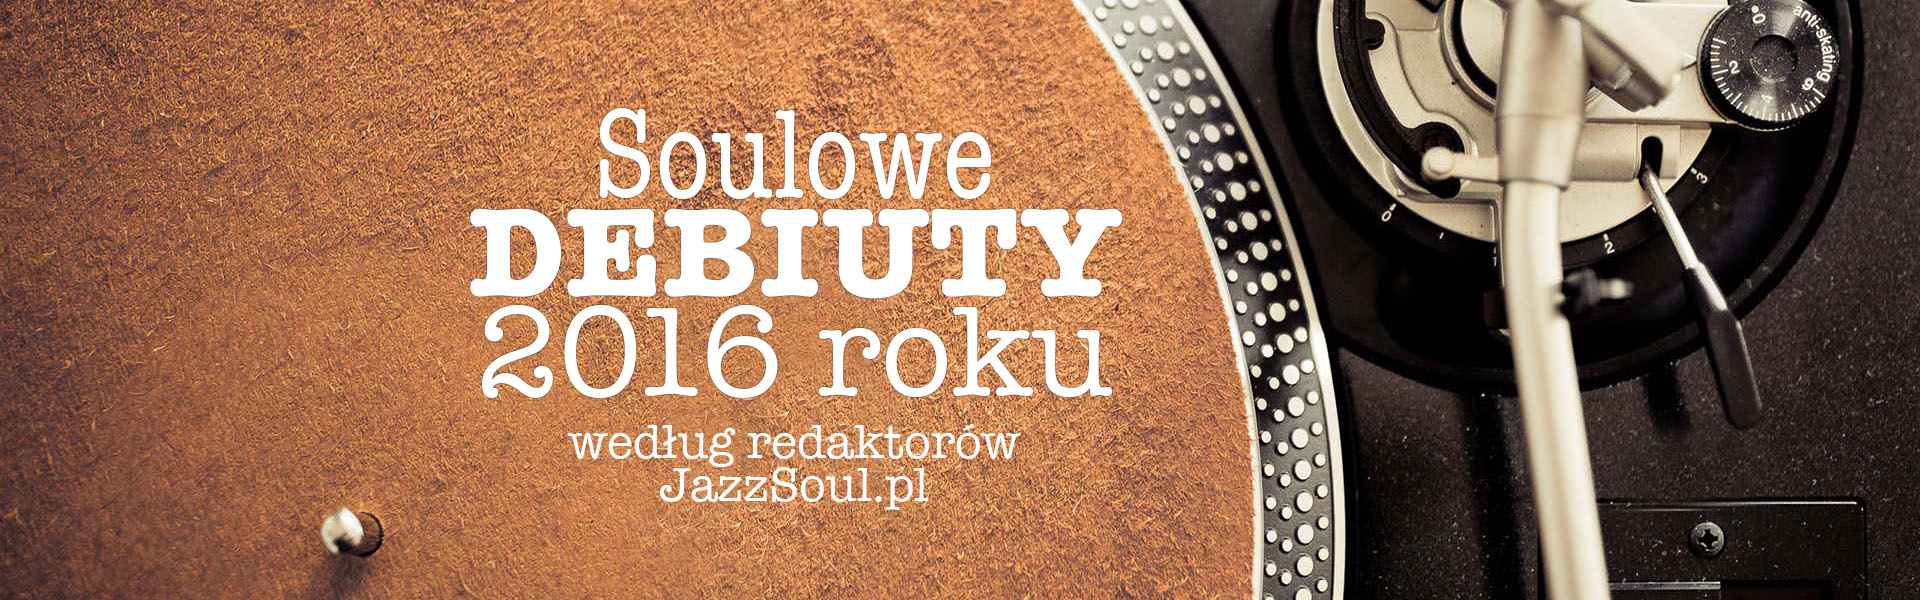 debiuty-soul-podsumowanie-2016